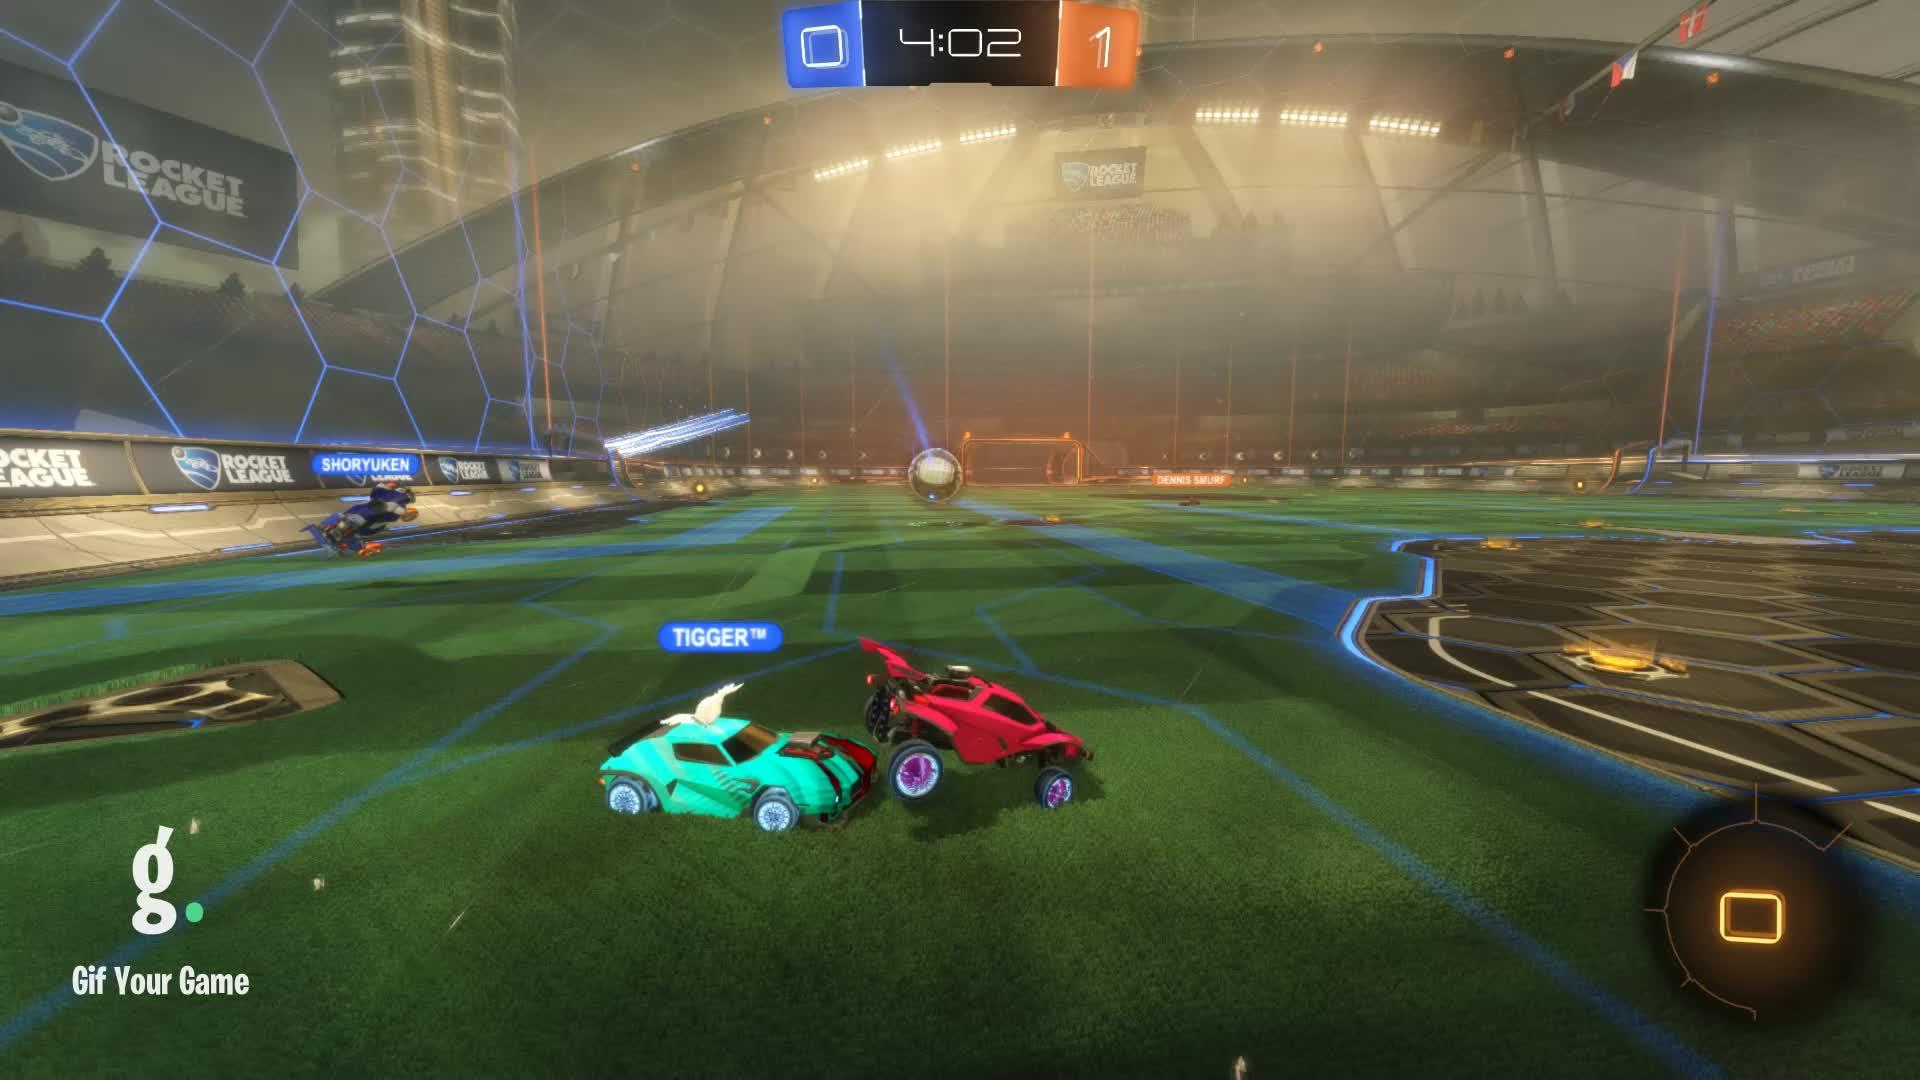 Gif Your Game, GifYourGame, Goal, Rocket League, RocketLeague, snus, Goal 2: TiggeR™ GIFs